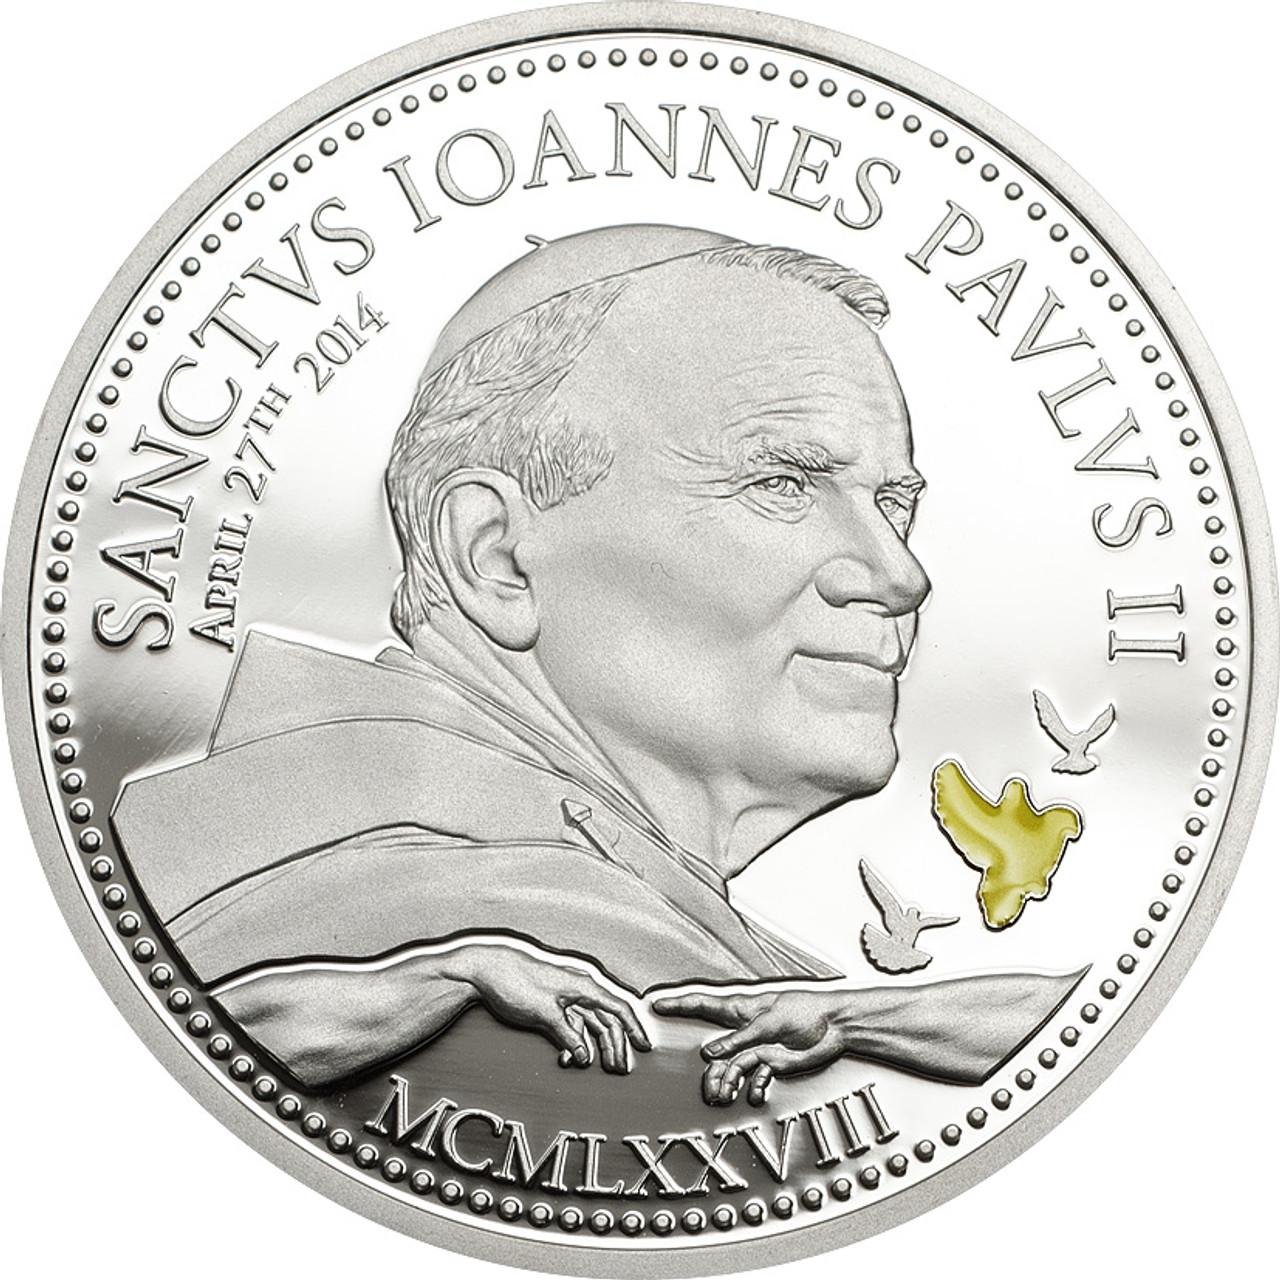 COMPLETE COA POPE JOHN PAUL II 2005 1OZ COOK ISLANDS $1 SILVER PROOF COIN